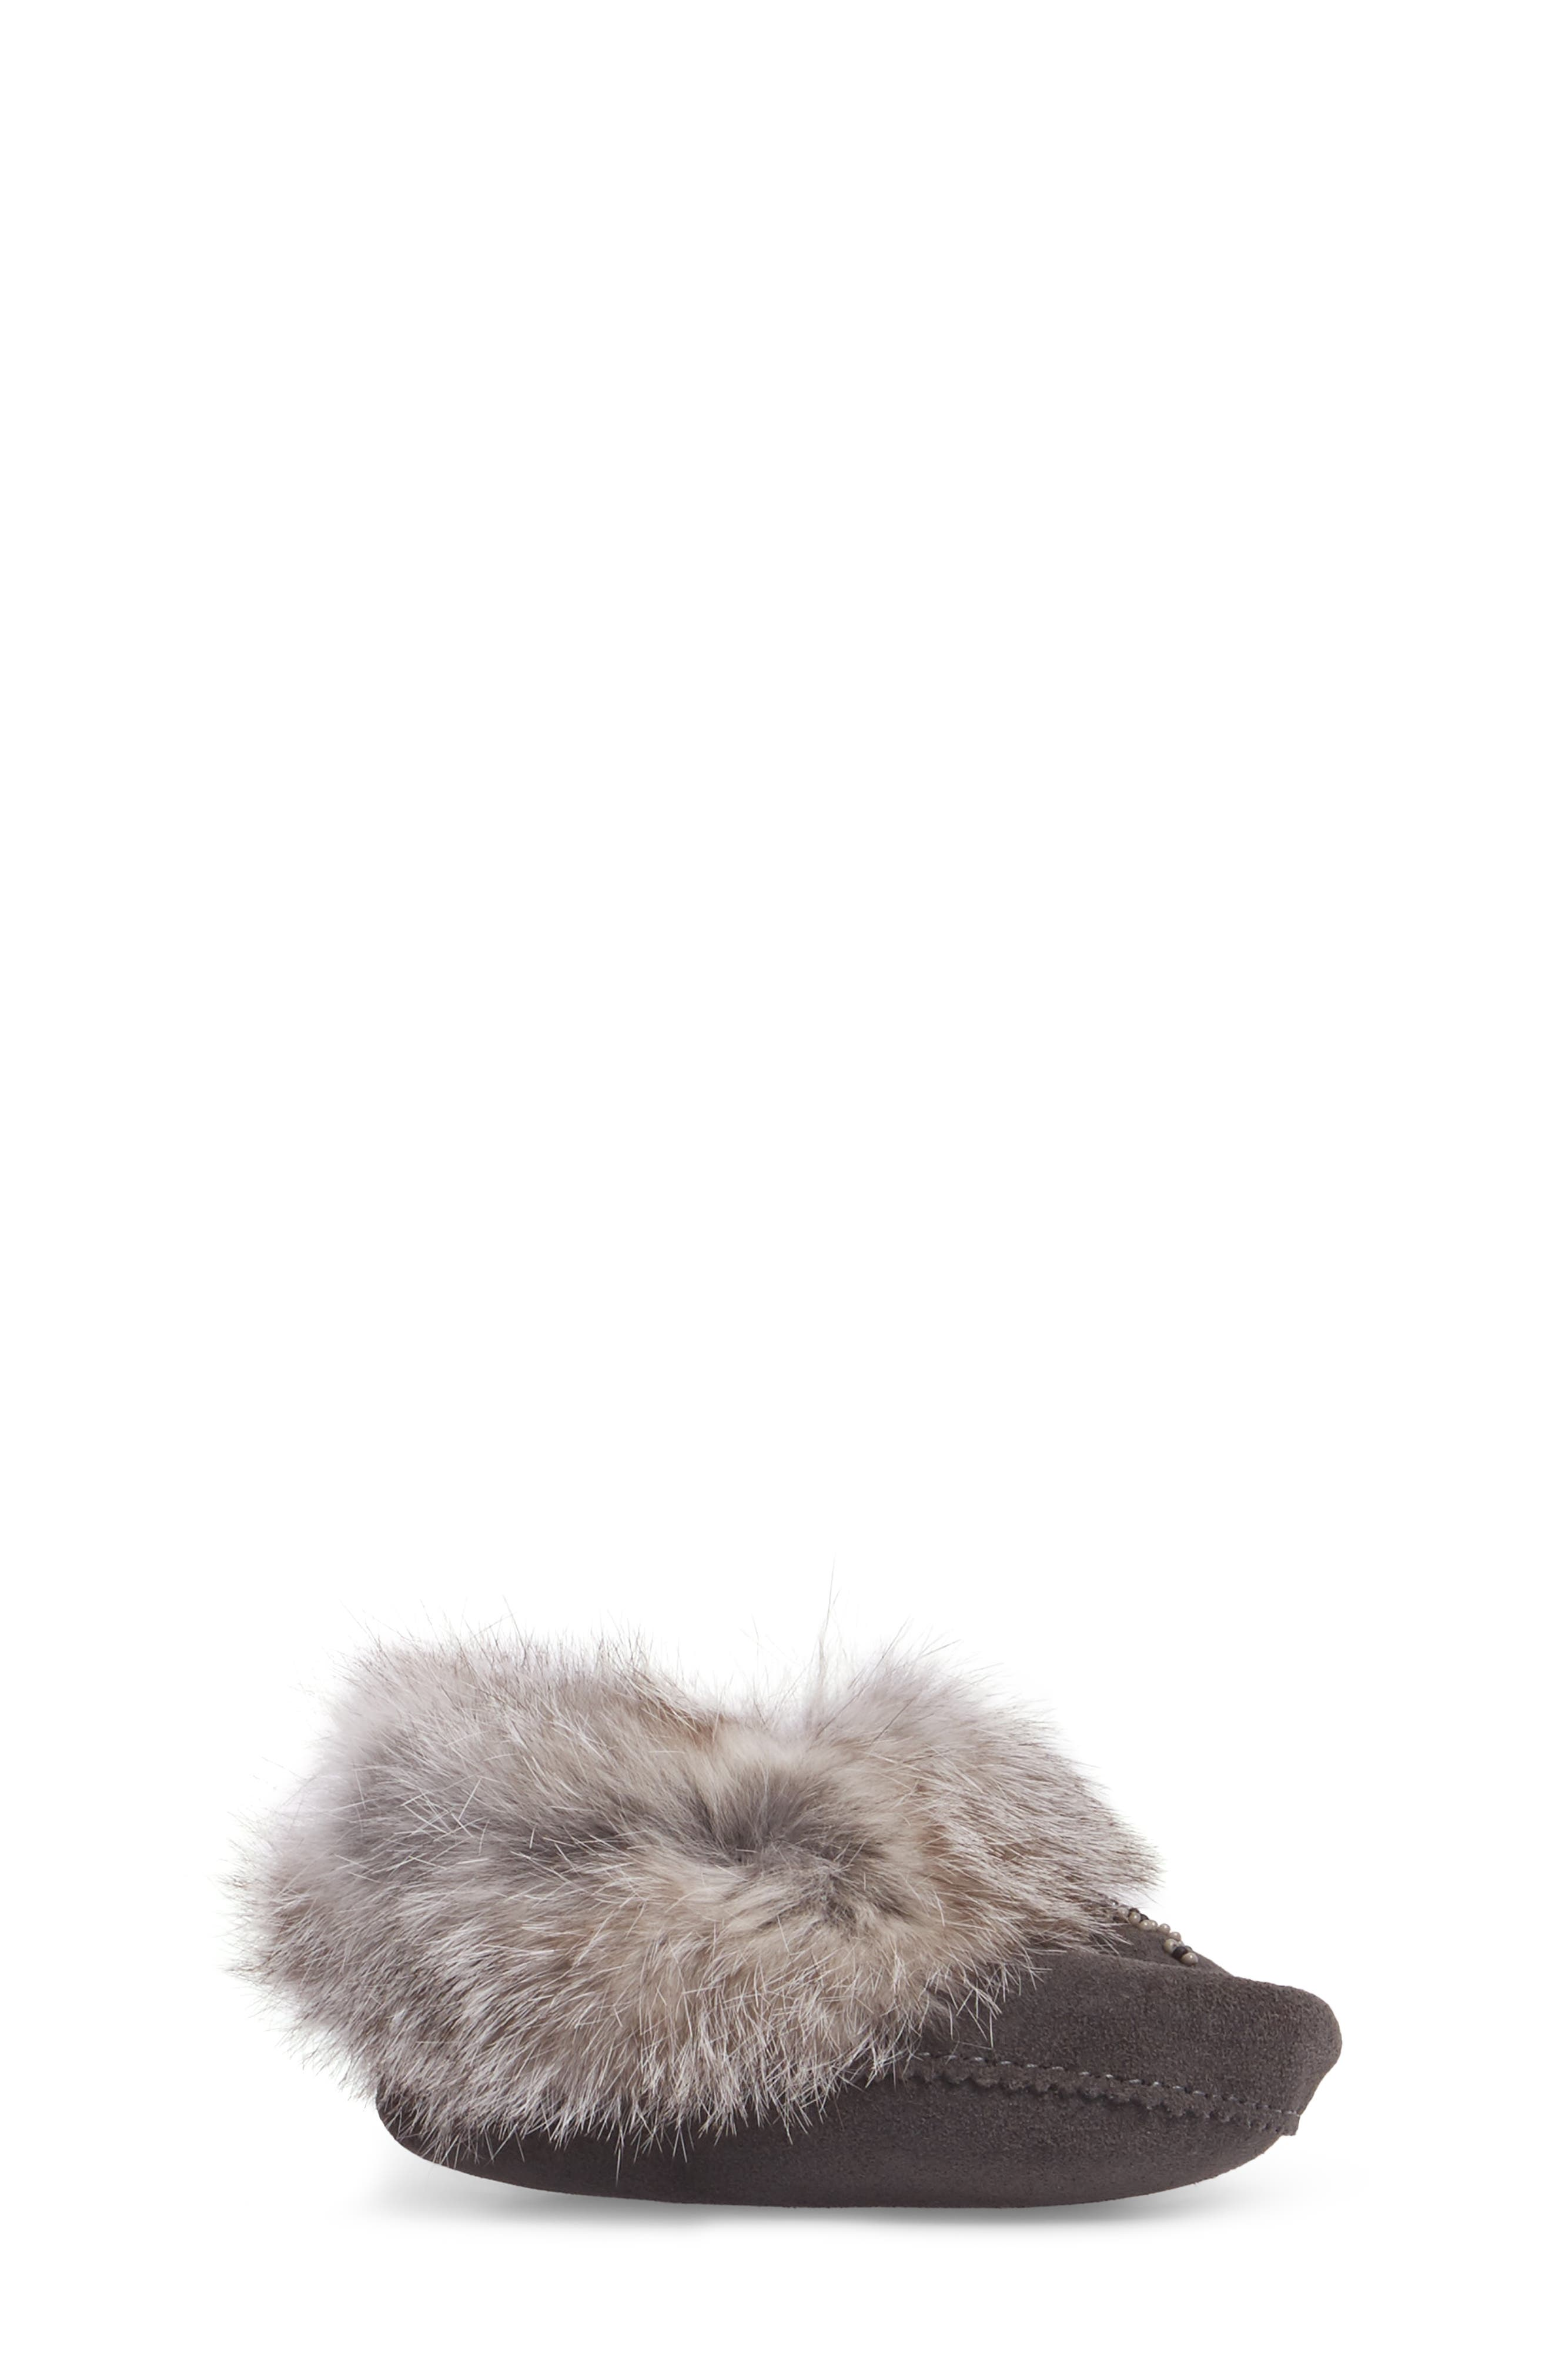 Genuine Rabbit Fur Moccasin,                             Alternate thumbnail 3, color,                             Charcoal